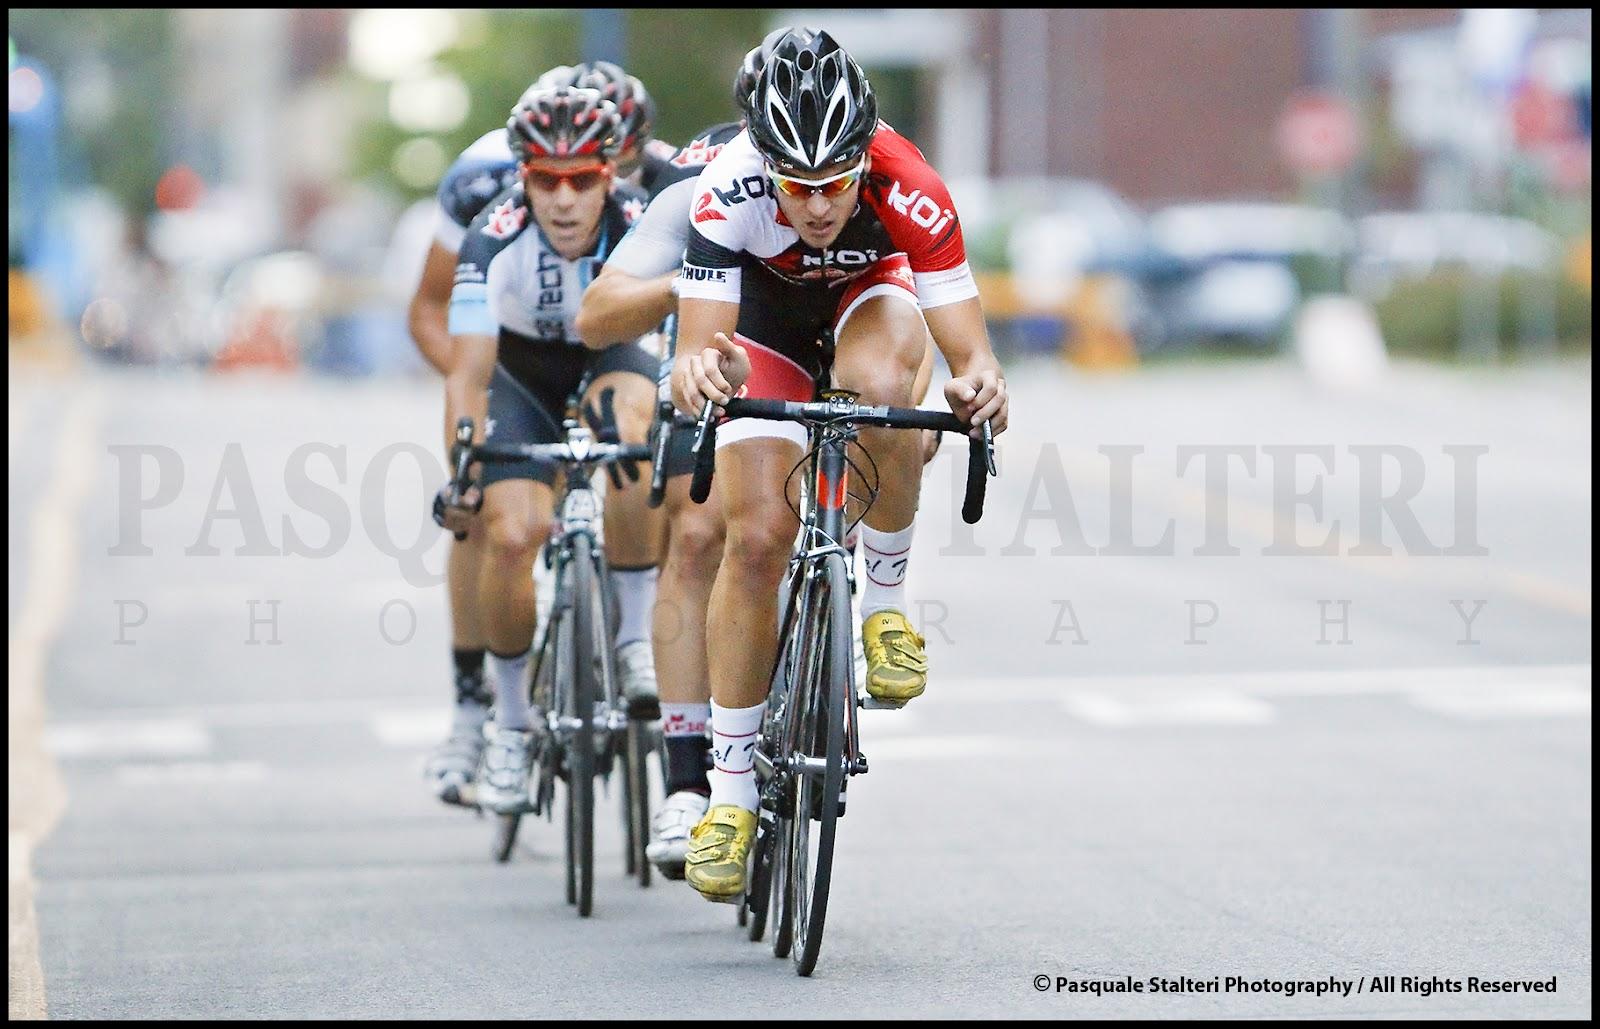 Pierrick naud remporte la 9eme tape des mardis cyclistes for La 9eme porte